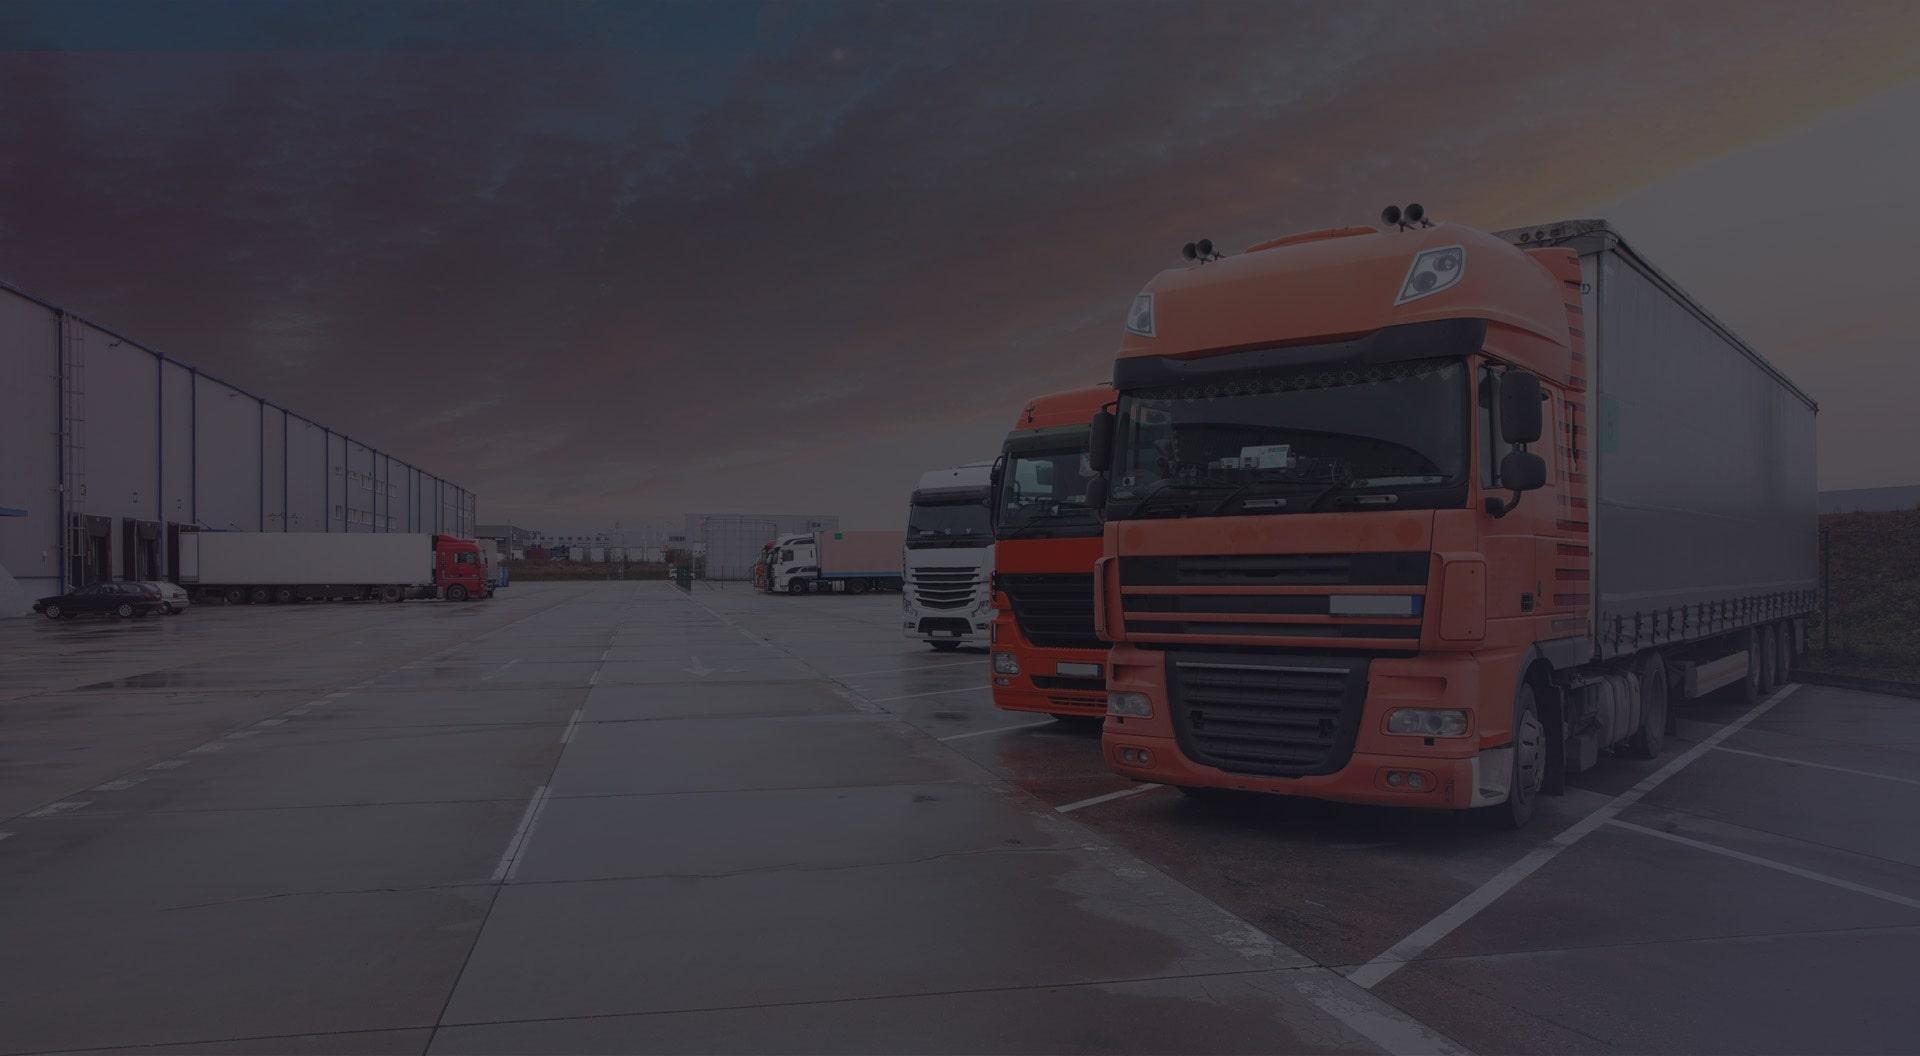 Trasporti stradali - Bertin Srl - Spedizioni internazionali